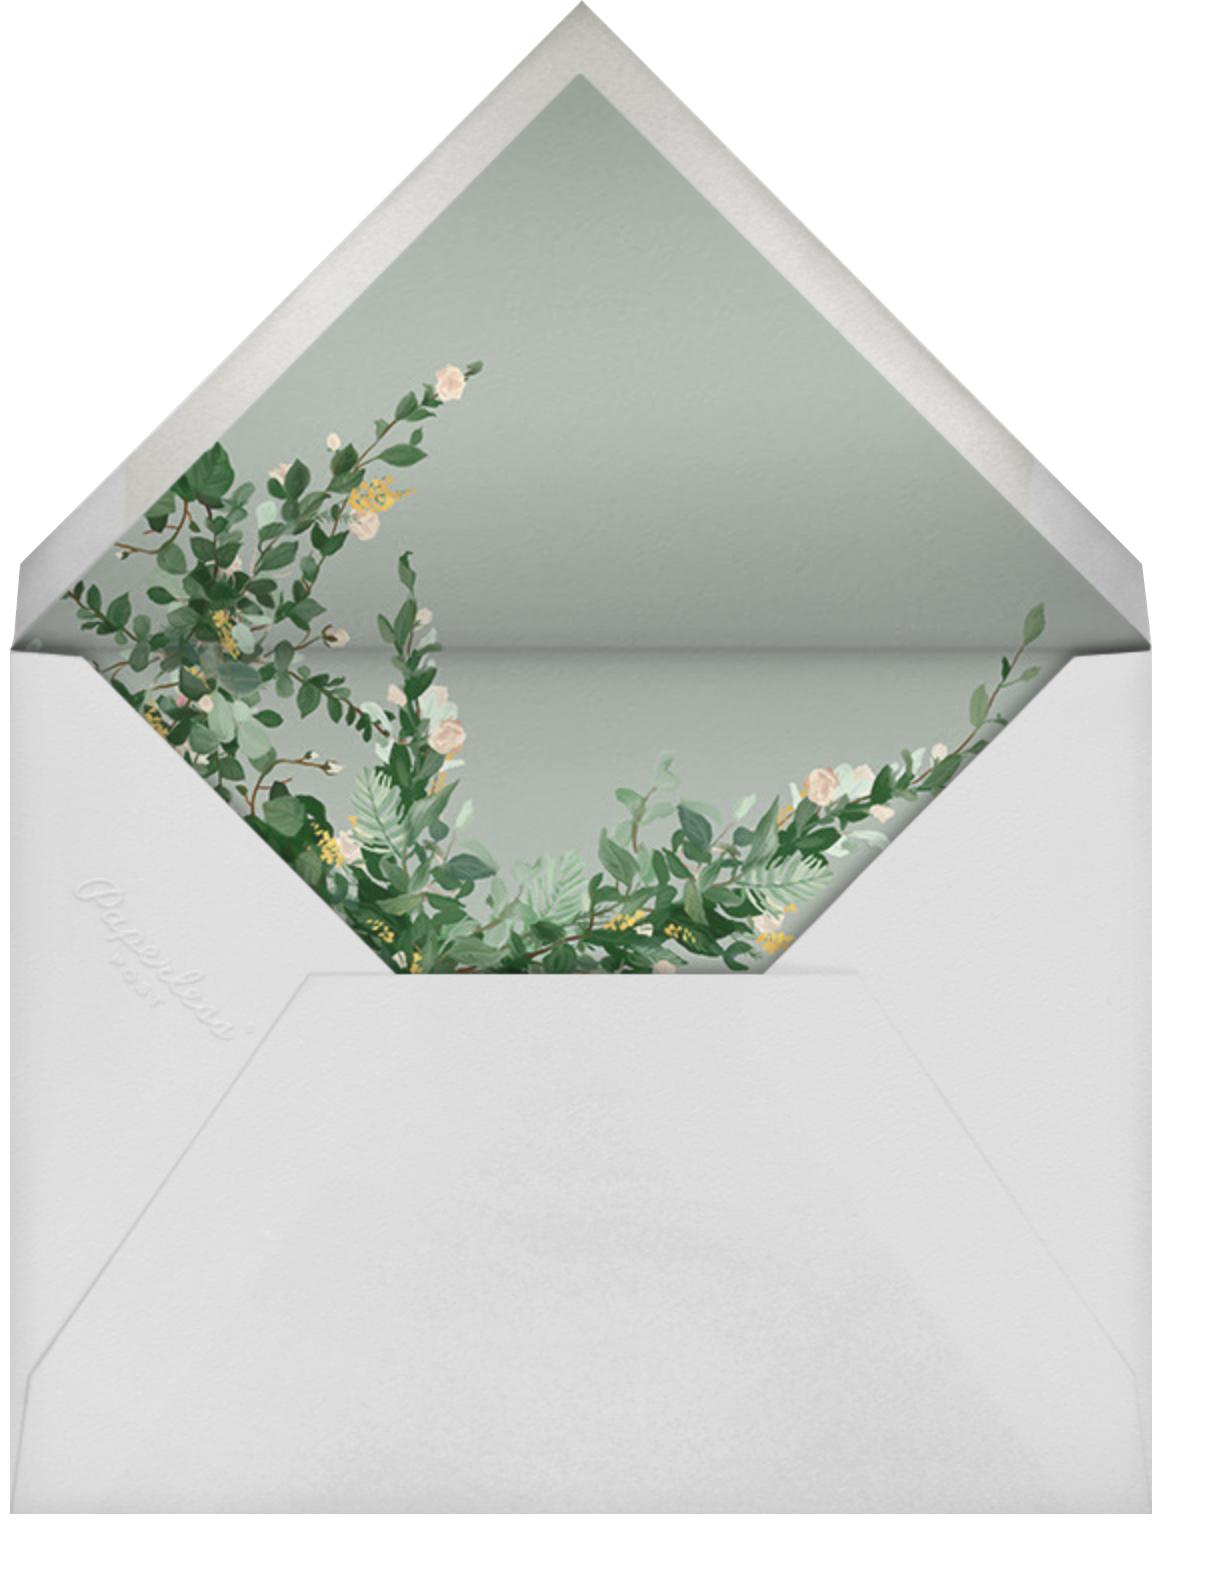 Rosedal - Athena - Paperless Post - Adult birthday - envelope back